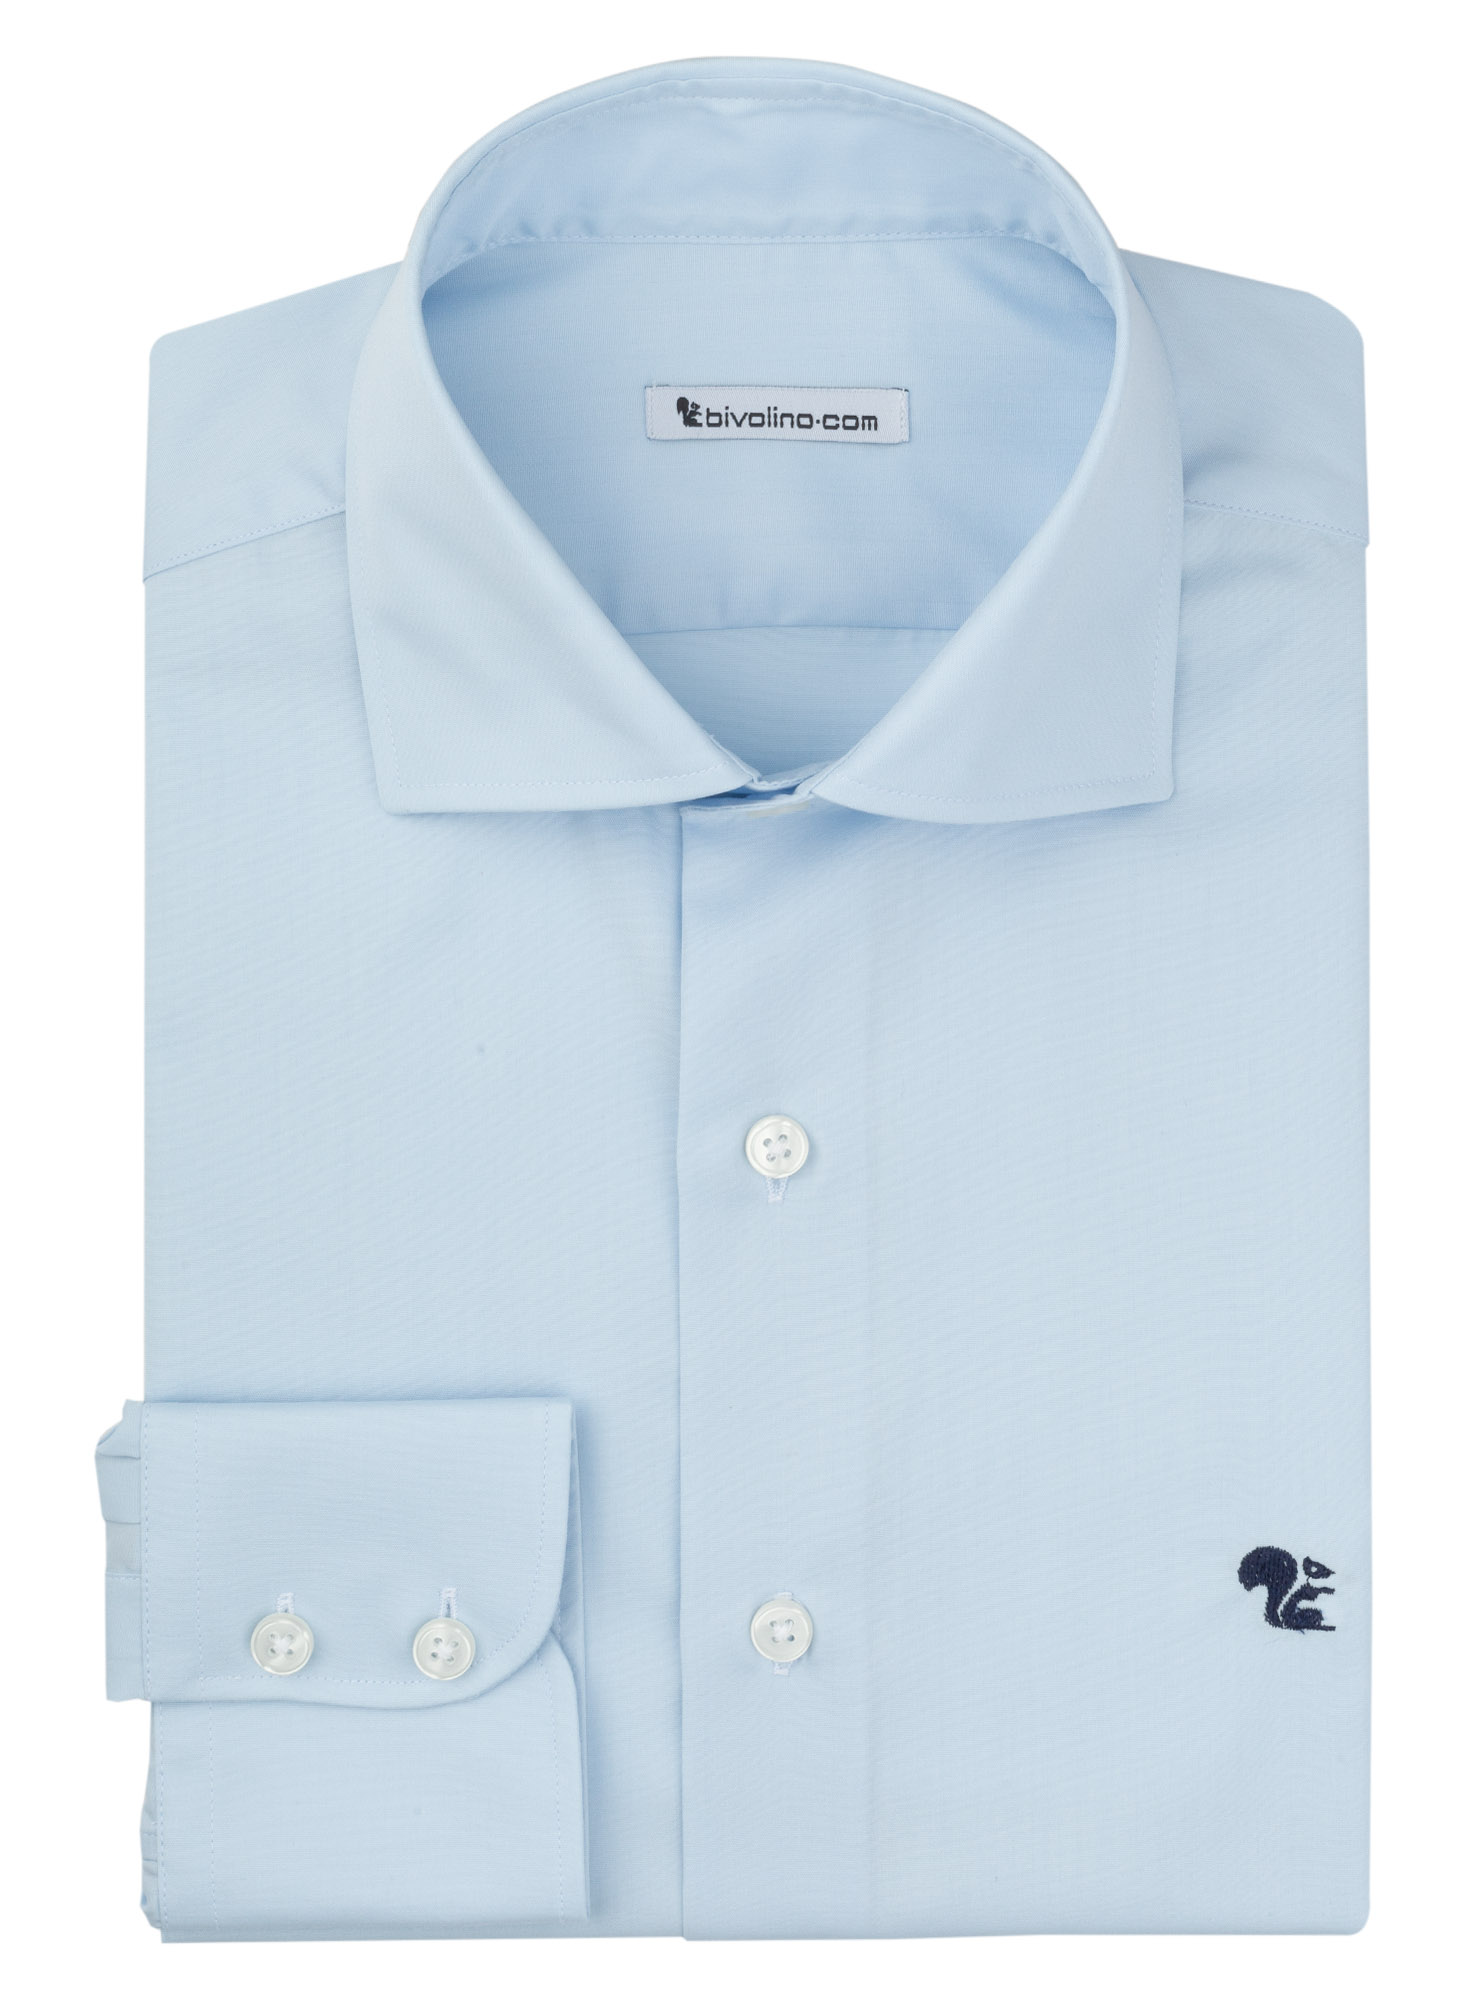 BARLETTA -  Popeline  uni blauw heren overhemd - MARCO 3